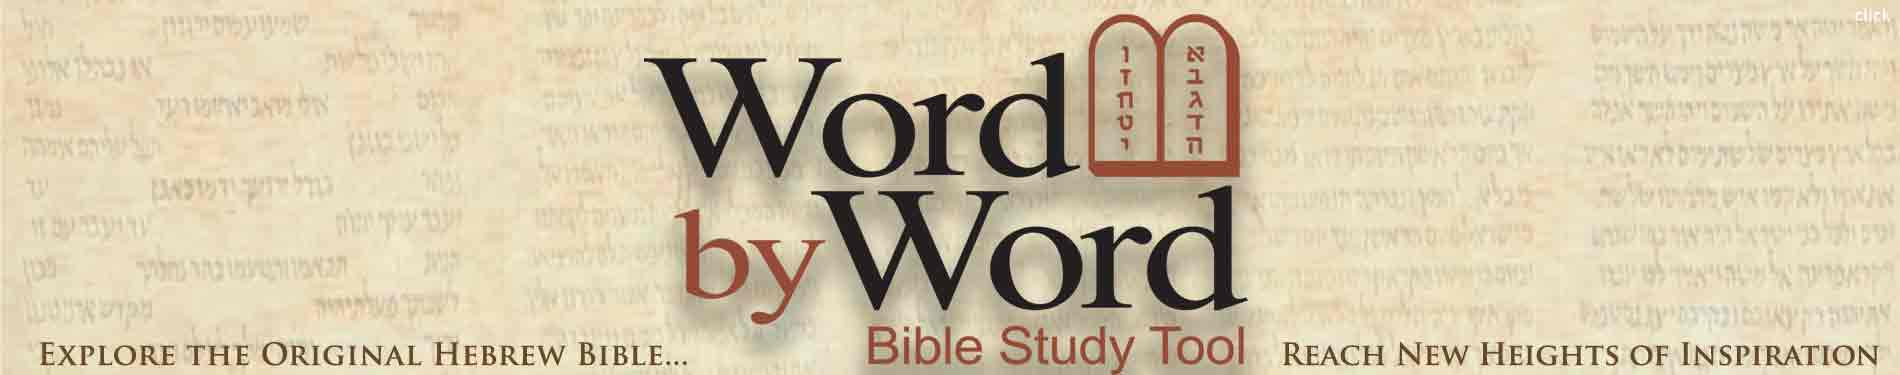 bible banner